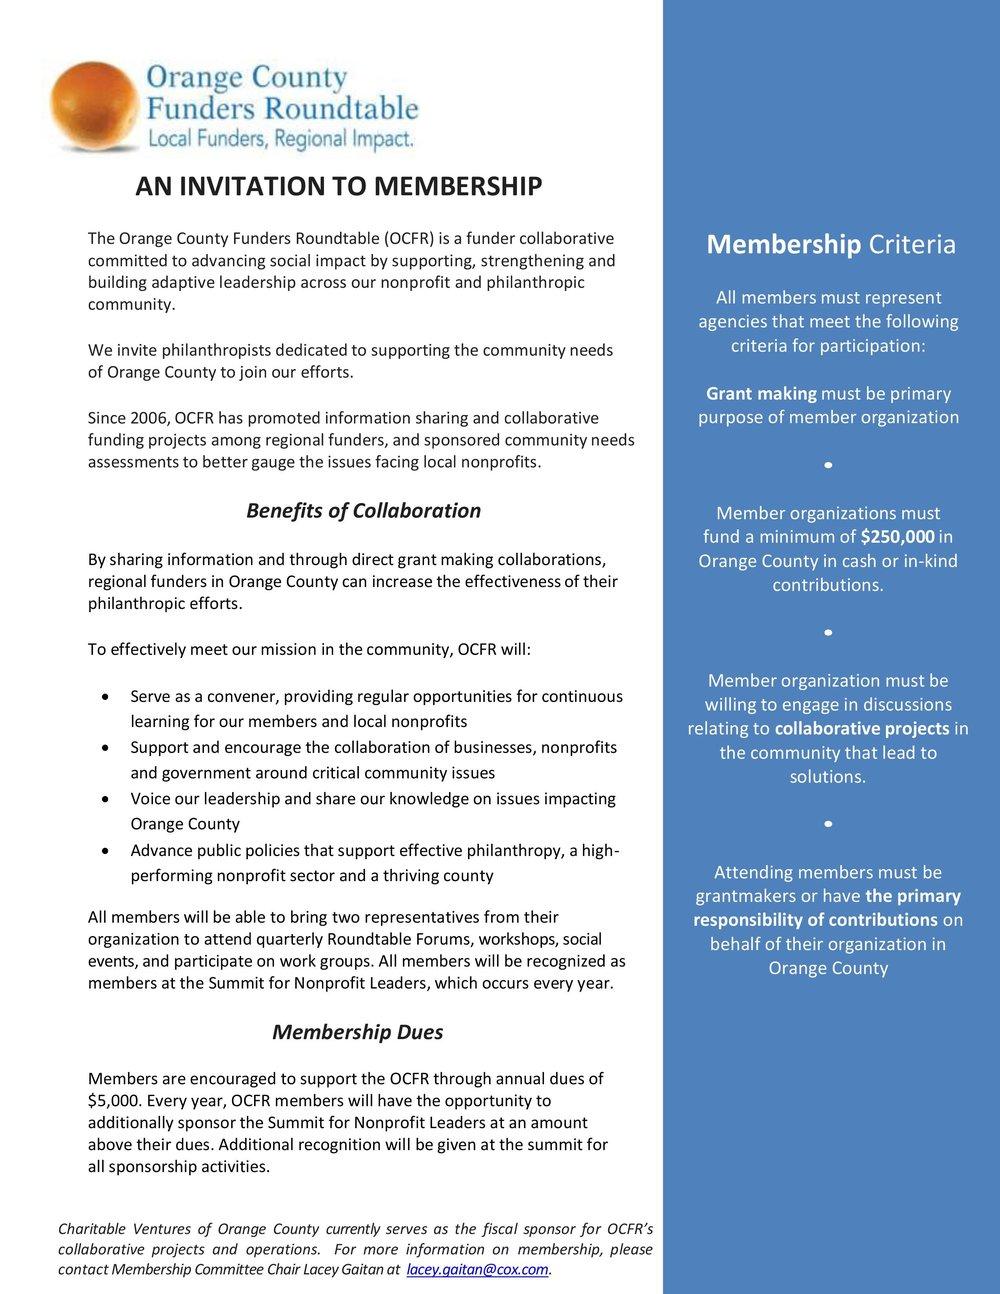 2018 Membership Criteria.jpg